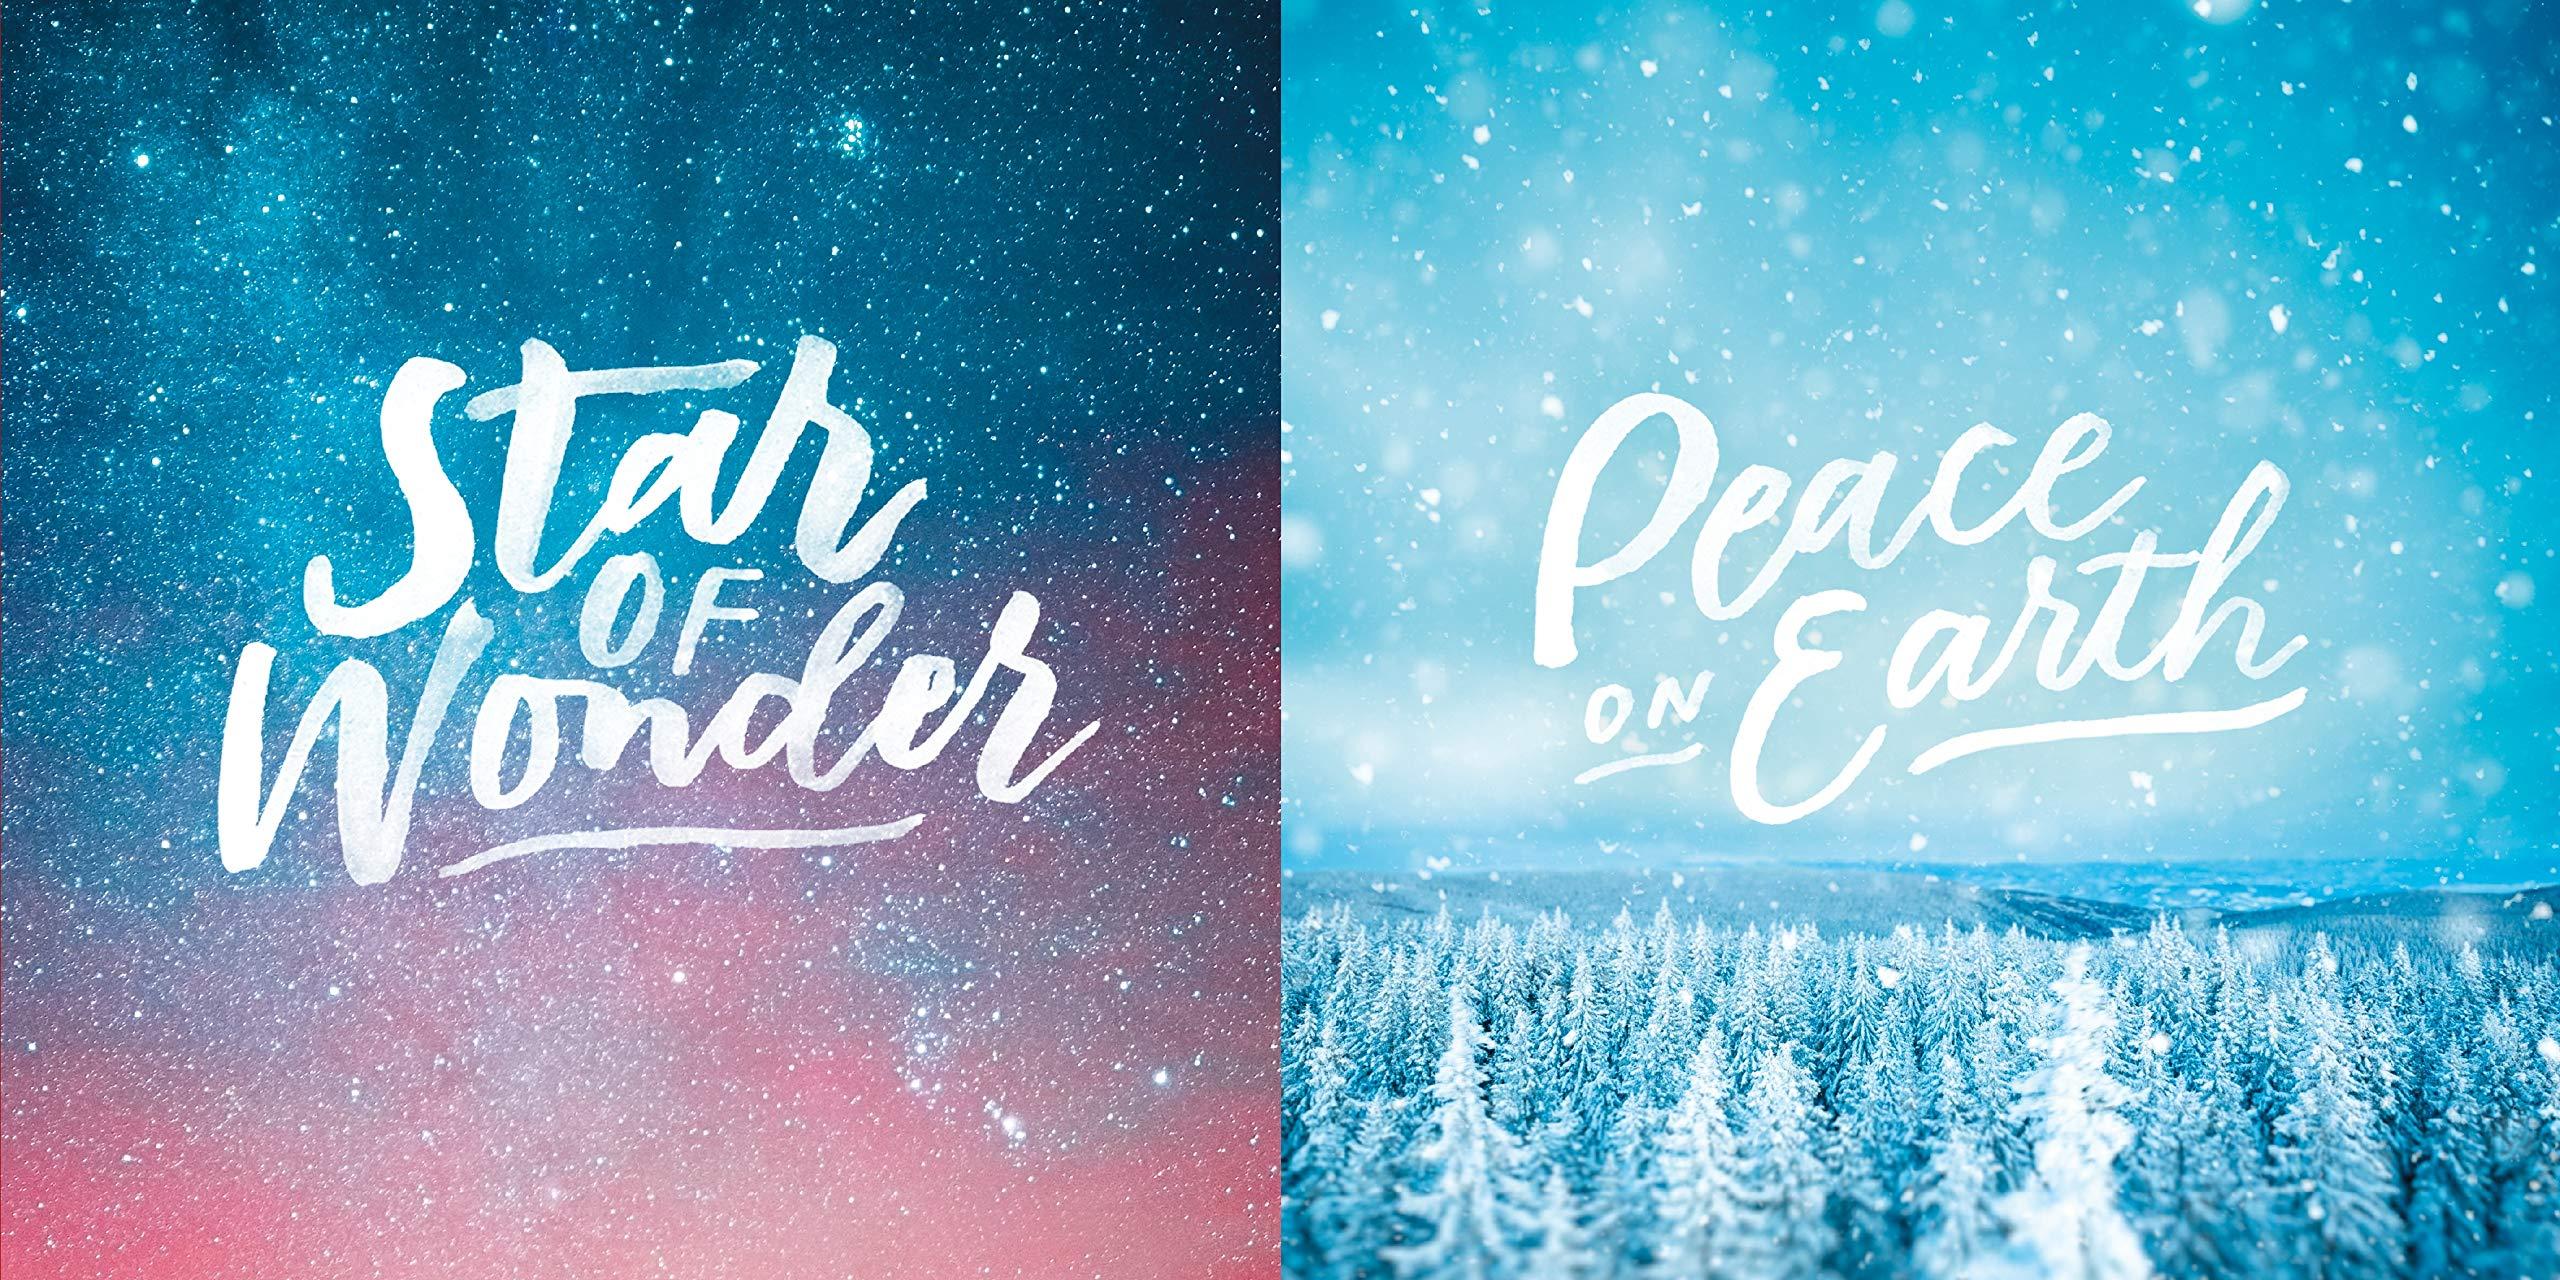 Festive Text 10-Pack Christmas Cards: Star of Wonder and Peace on Earth: Amazon.es: Spck Spck: Libros en idiomas extranjeros